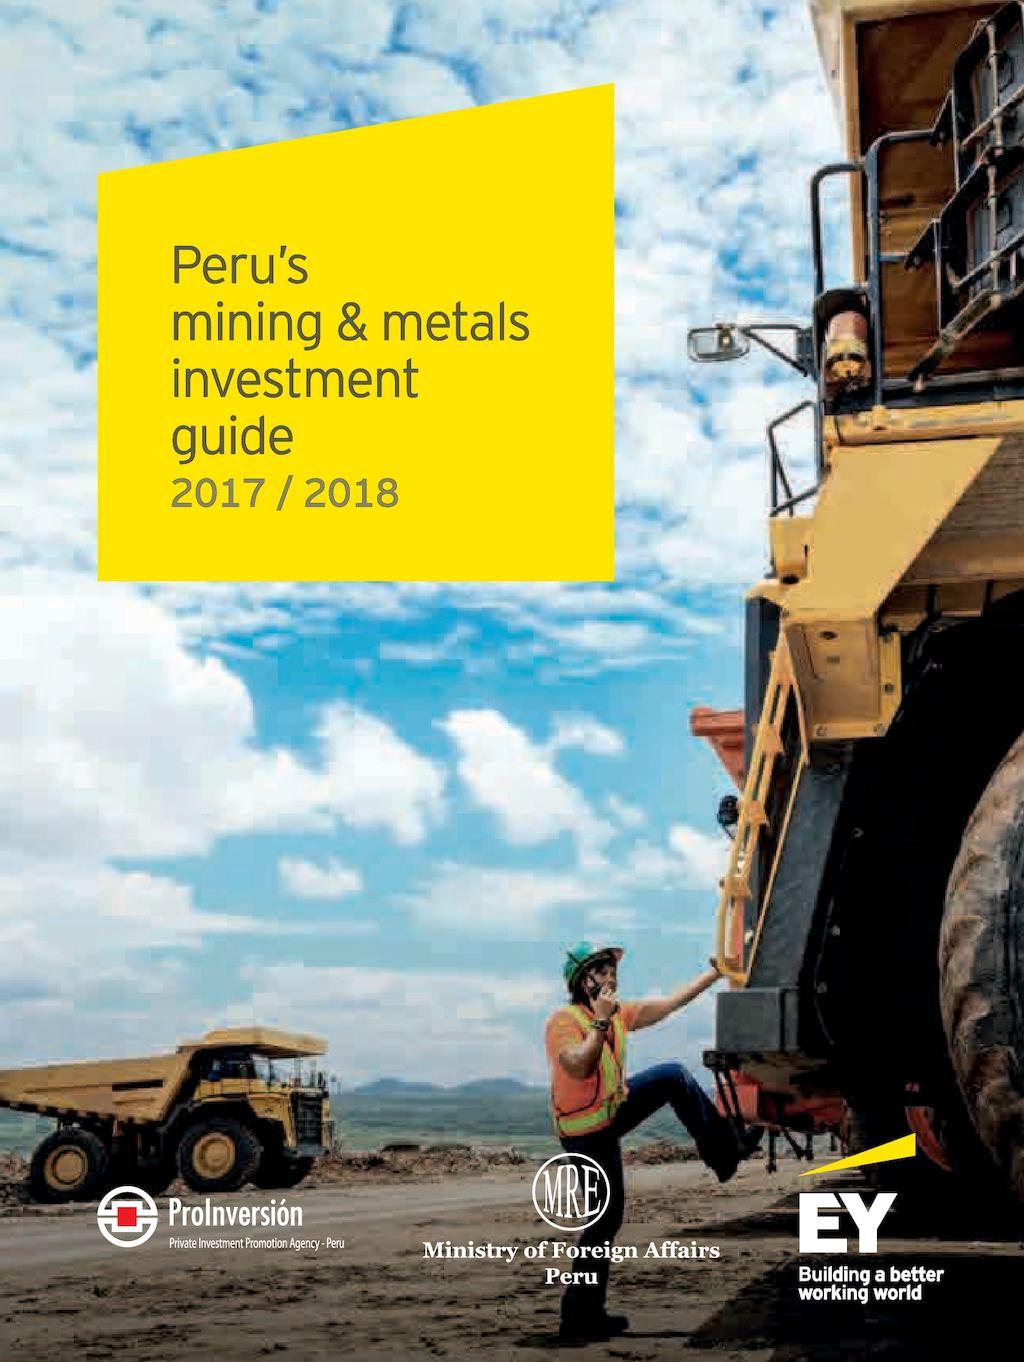 Calaméo - Ey Peru Mining Metals Investment Guide 2017 2018